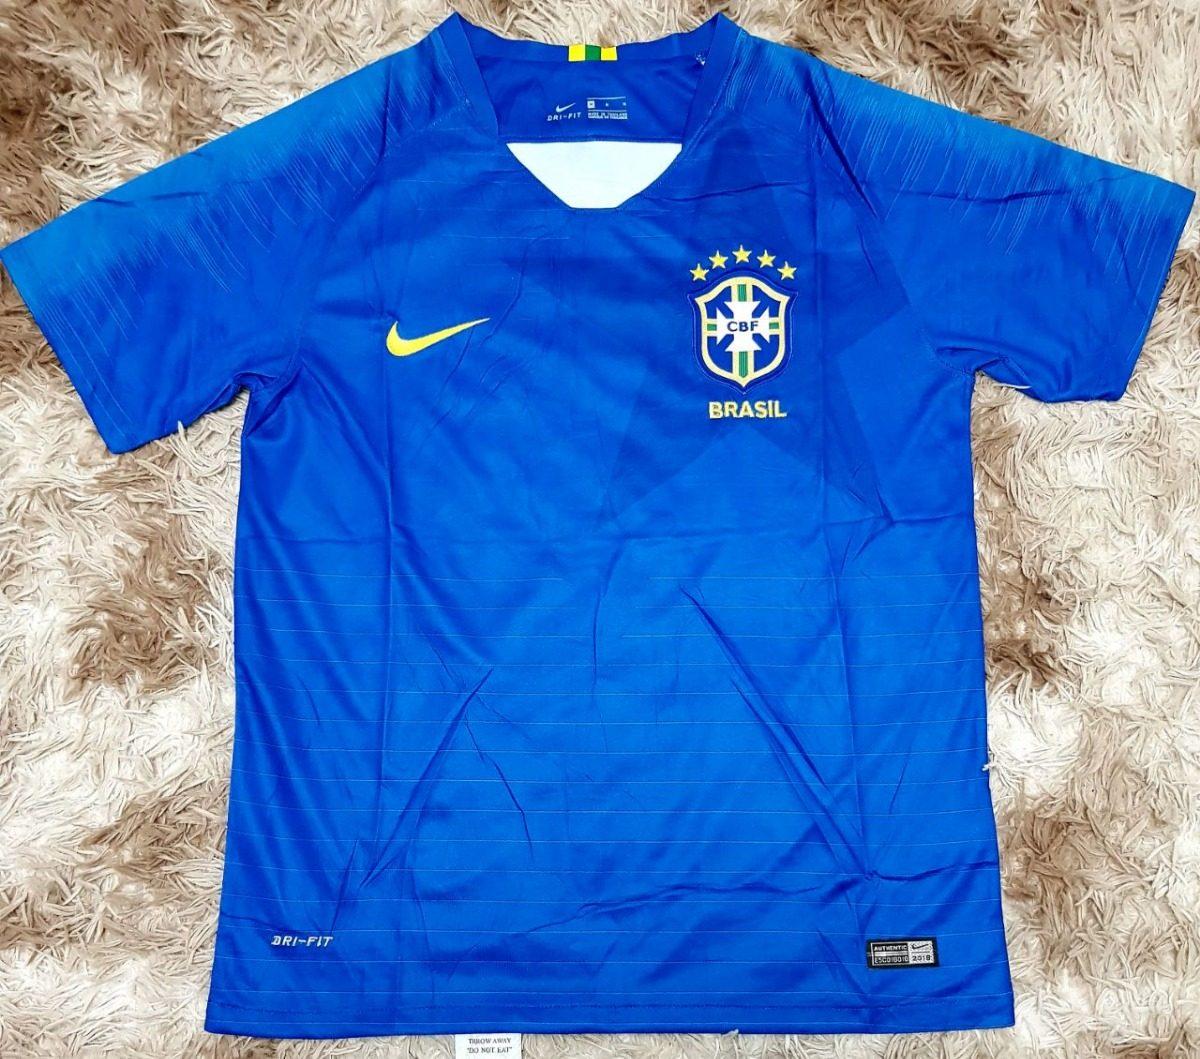 camisa oficial brasil copa 2018 azul original fifa. Carregando zoom. 939aef3b41f69